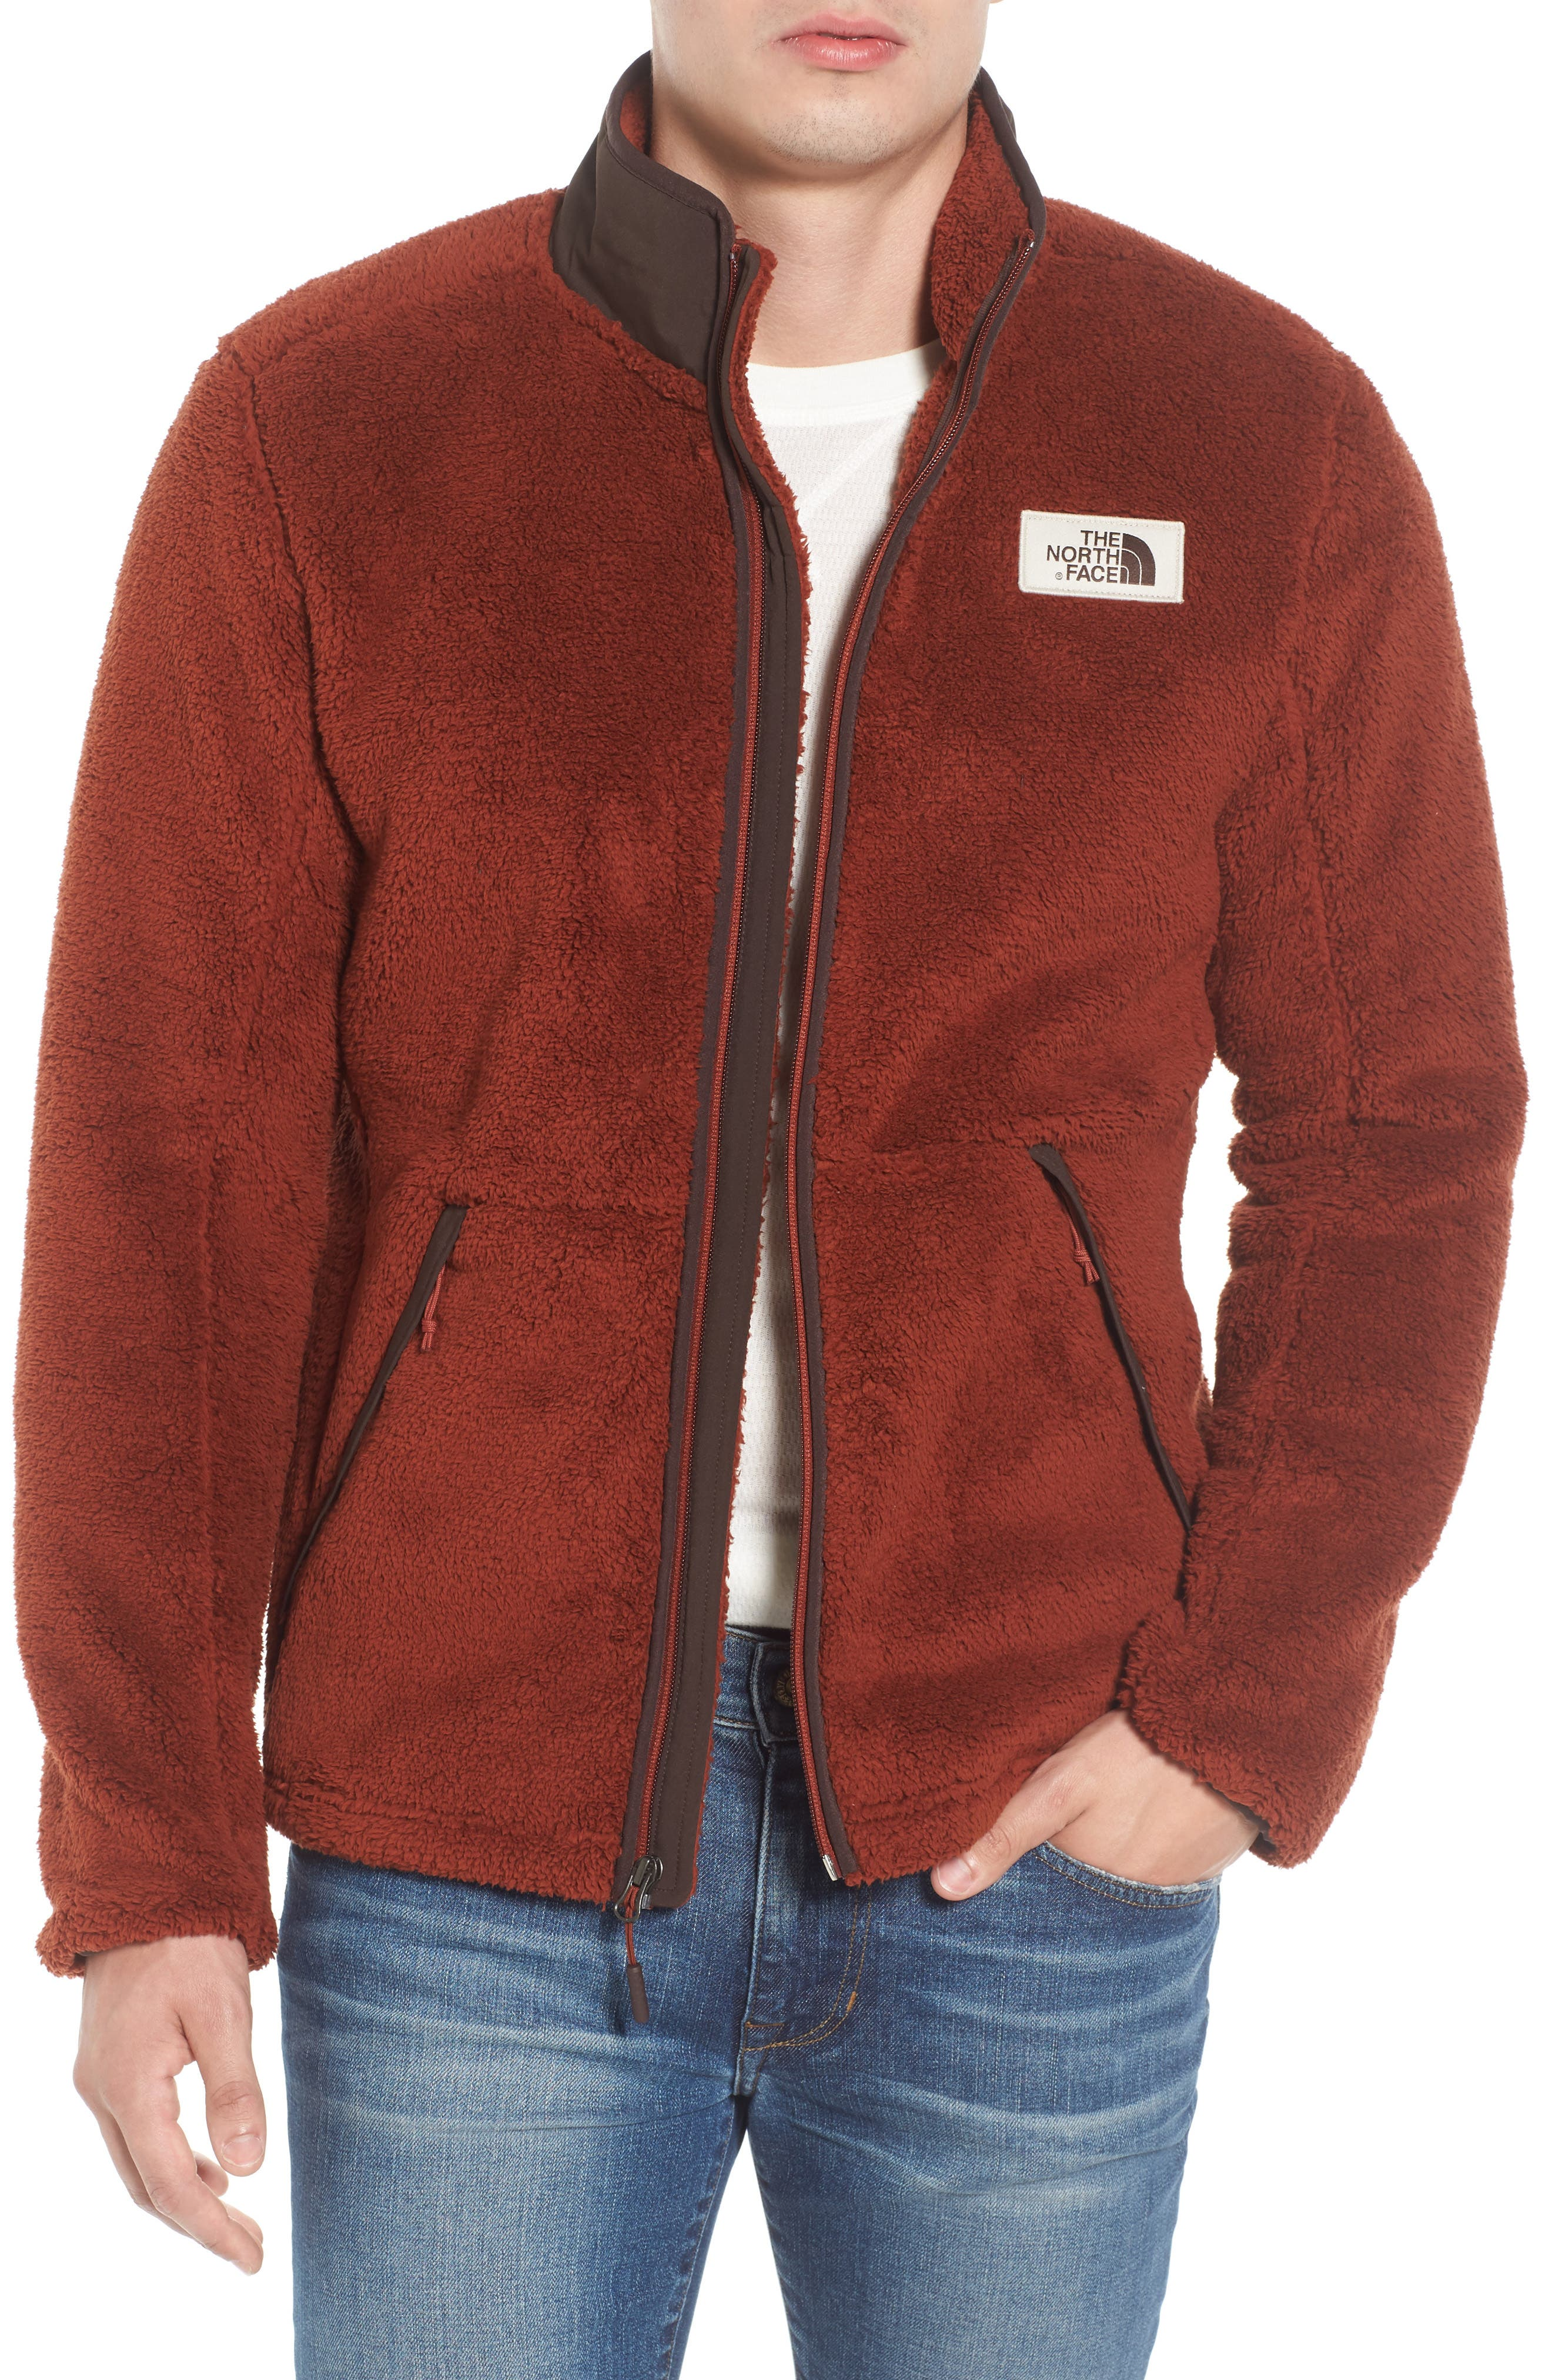 Campshire Zip Fleece Jacket,                         Main,                         color, Brandy Brown